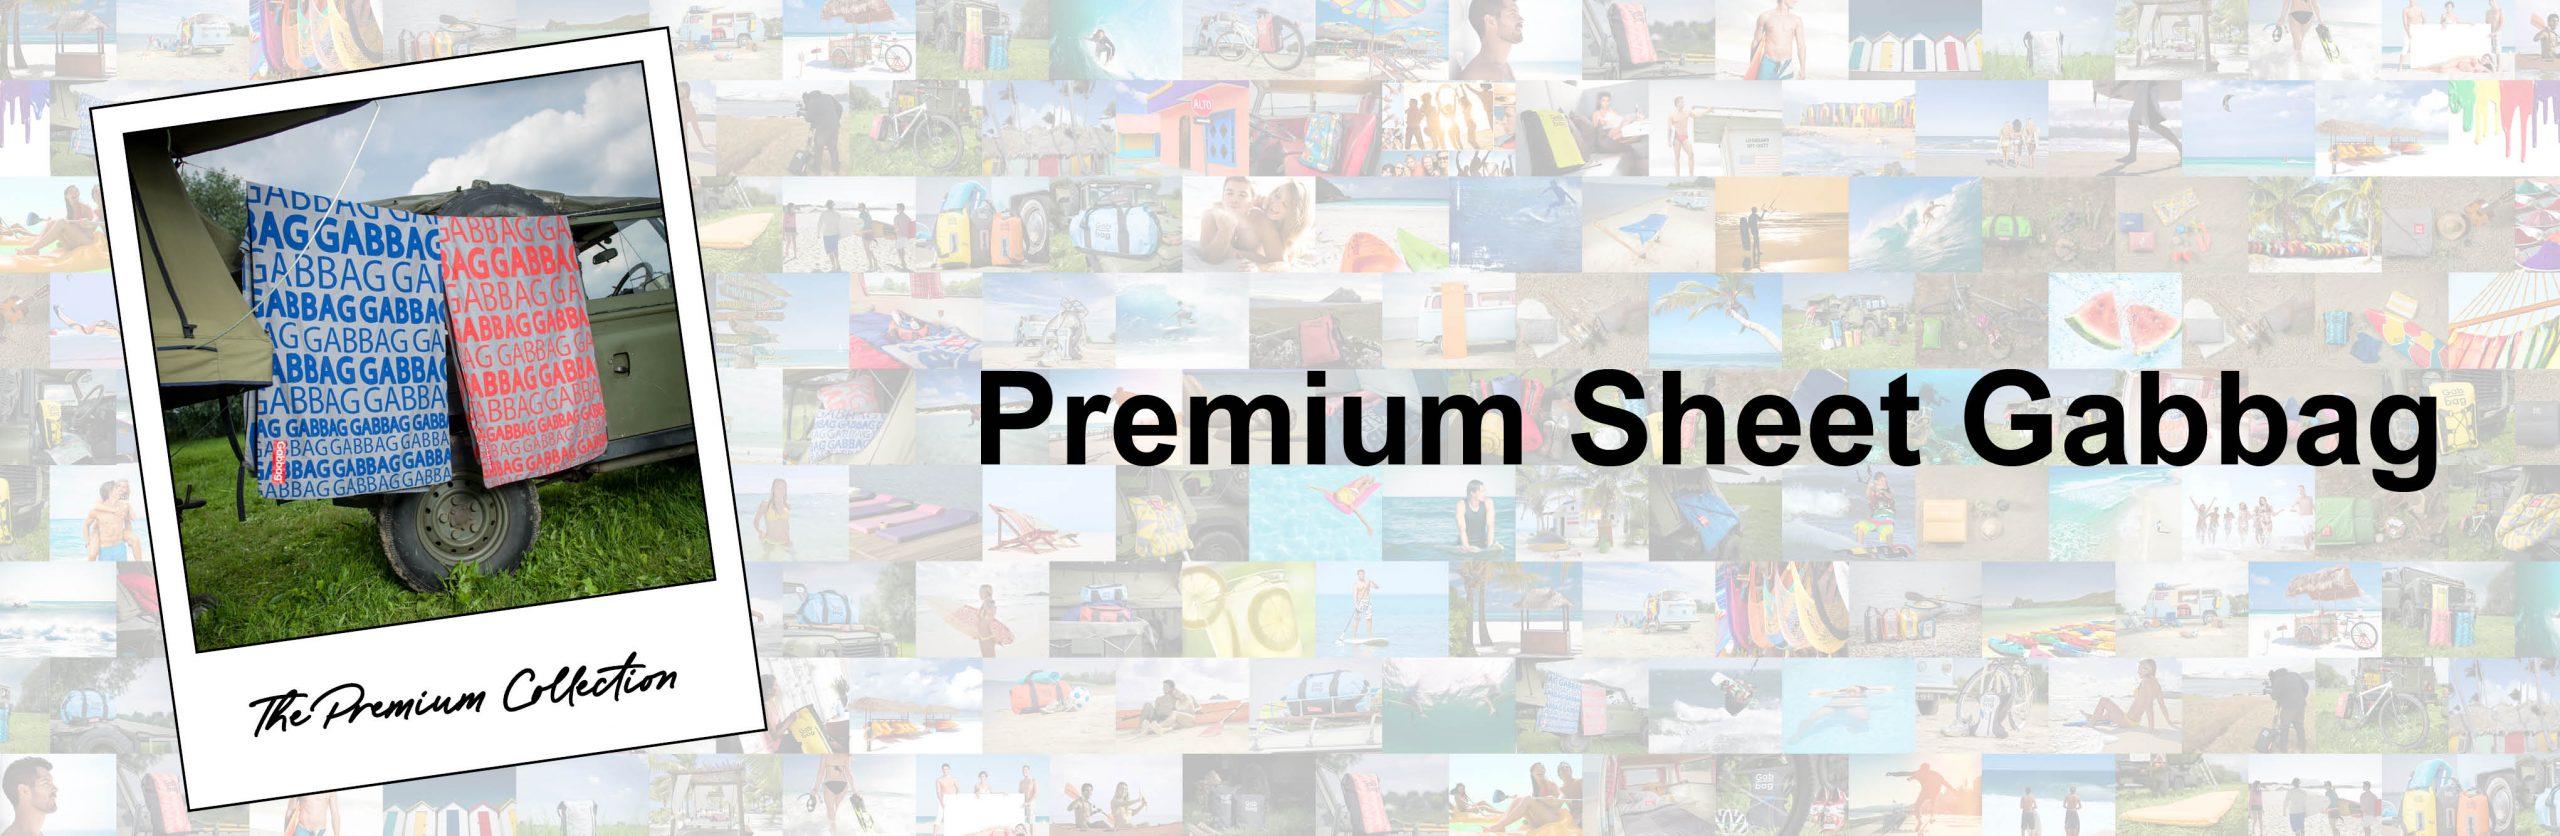 Premium Sheet Gabbag